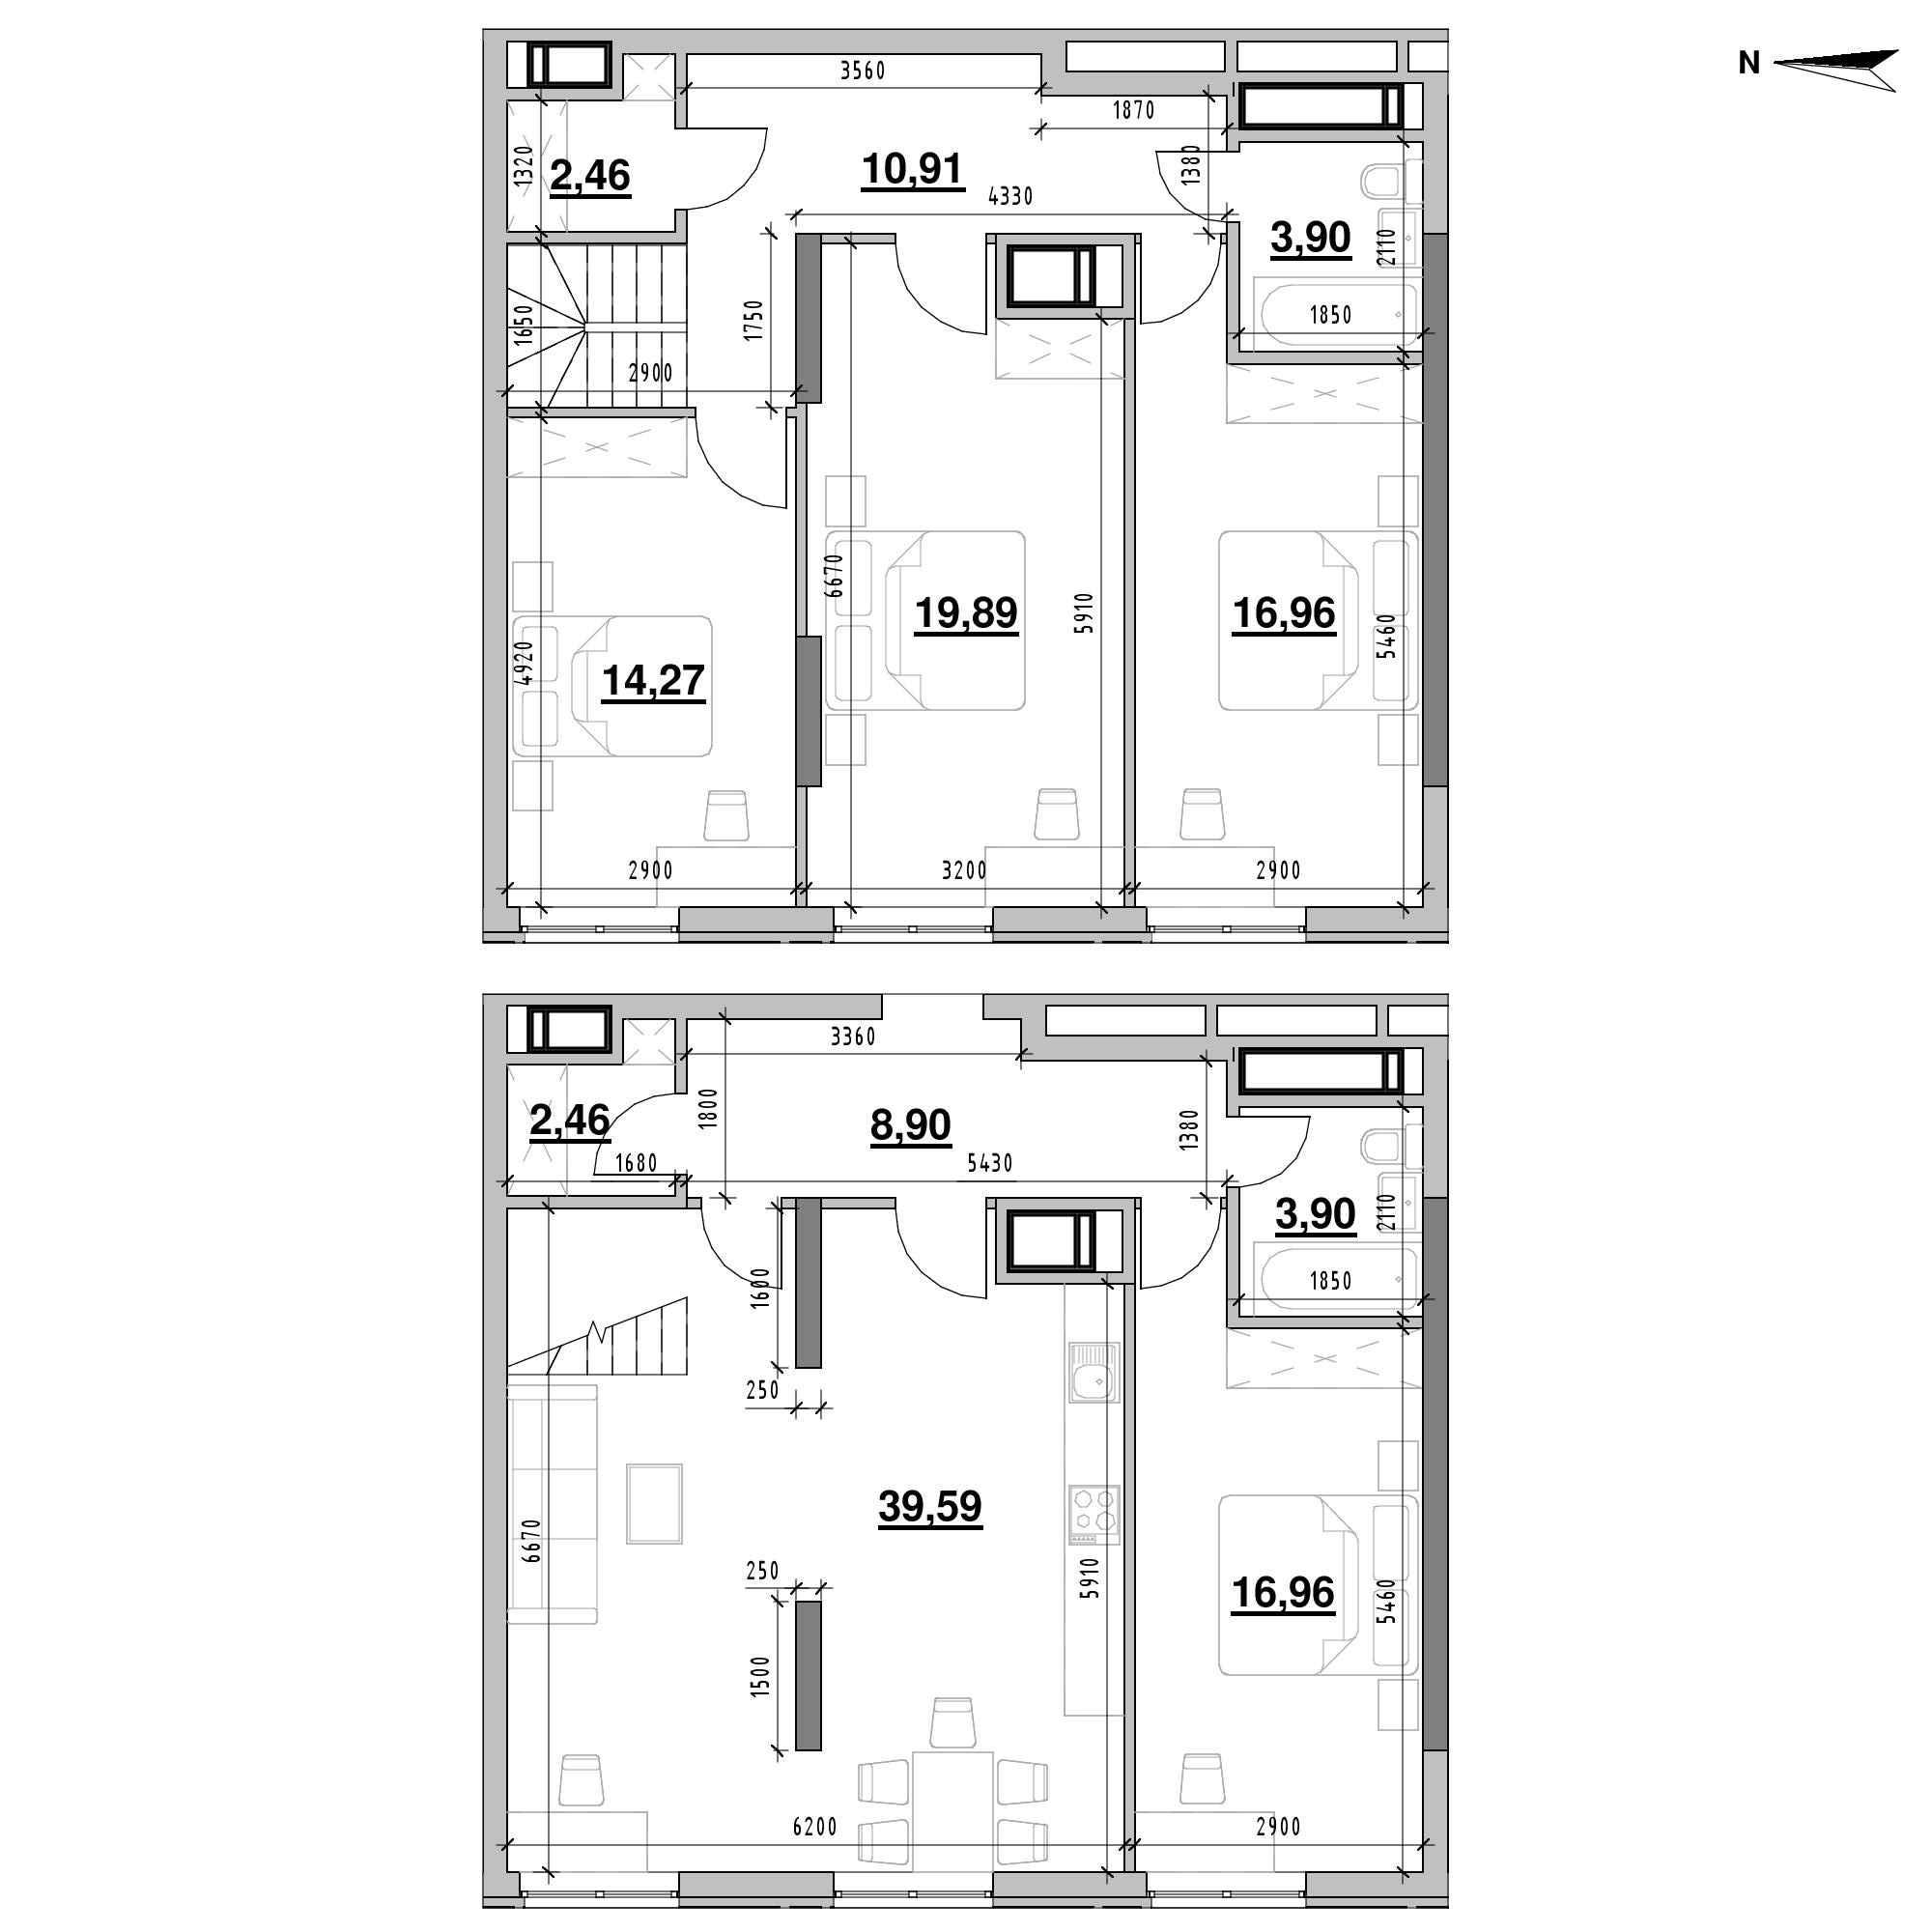 ЖК Nordica Residence: планування 4-кімнатної квартири, №211, 140.2 м<sup>2</sup>